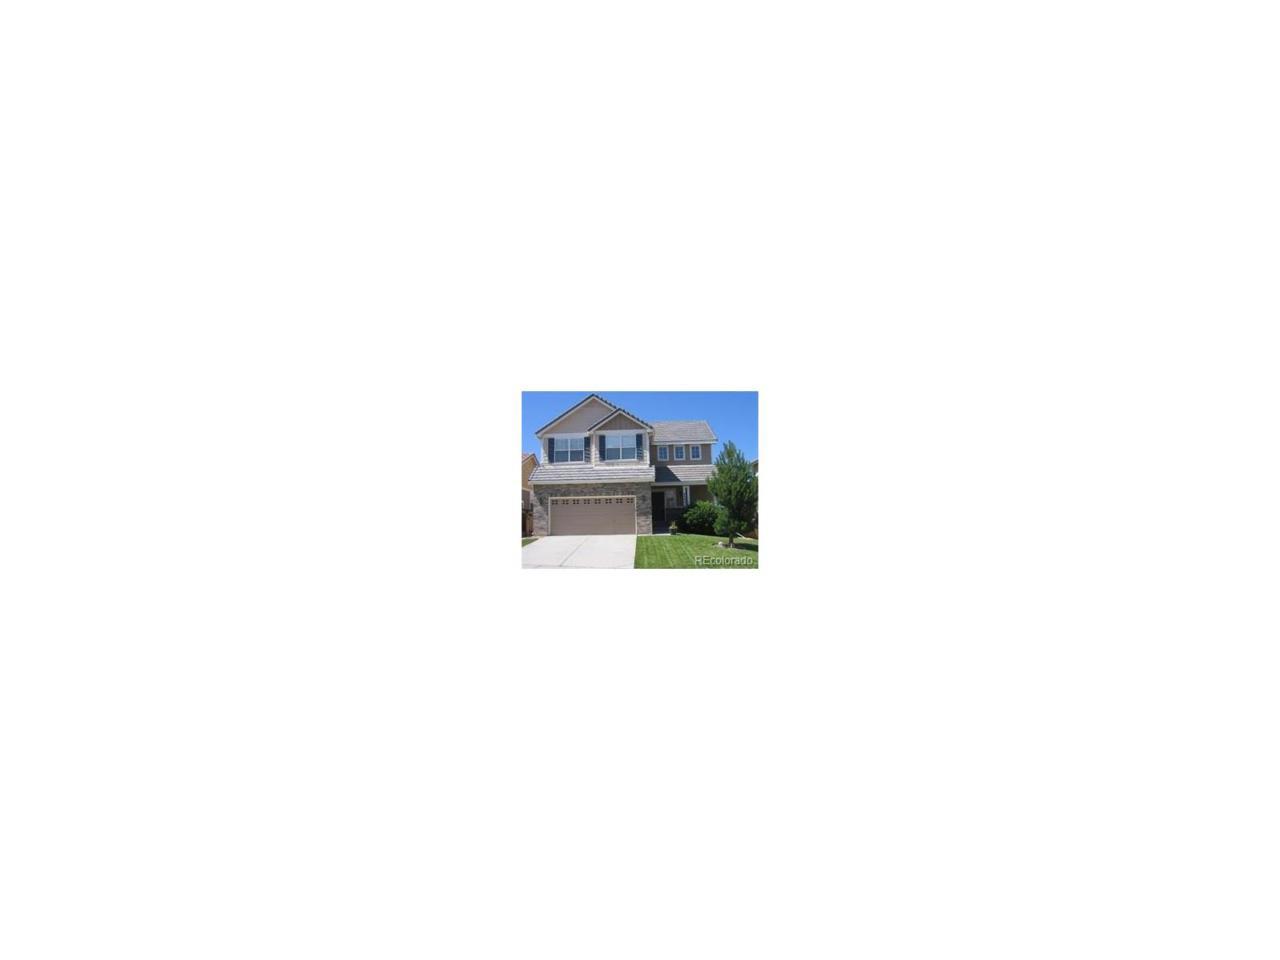 4005 Shane Valley Trail, Castle Rock, CO 80109 (MLS #2863401) :: 8z Real Estate